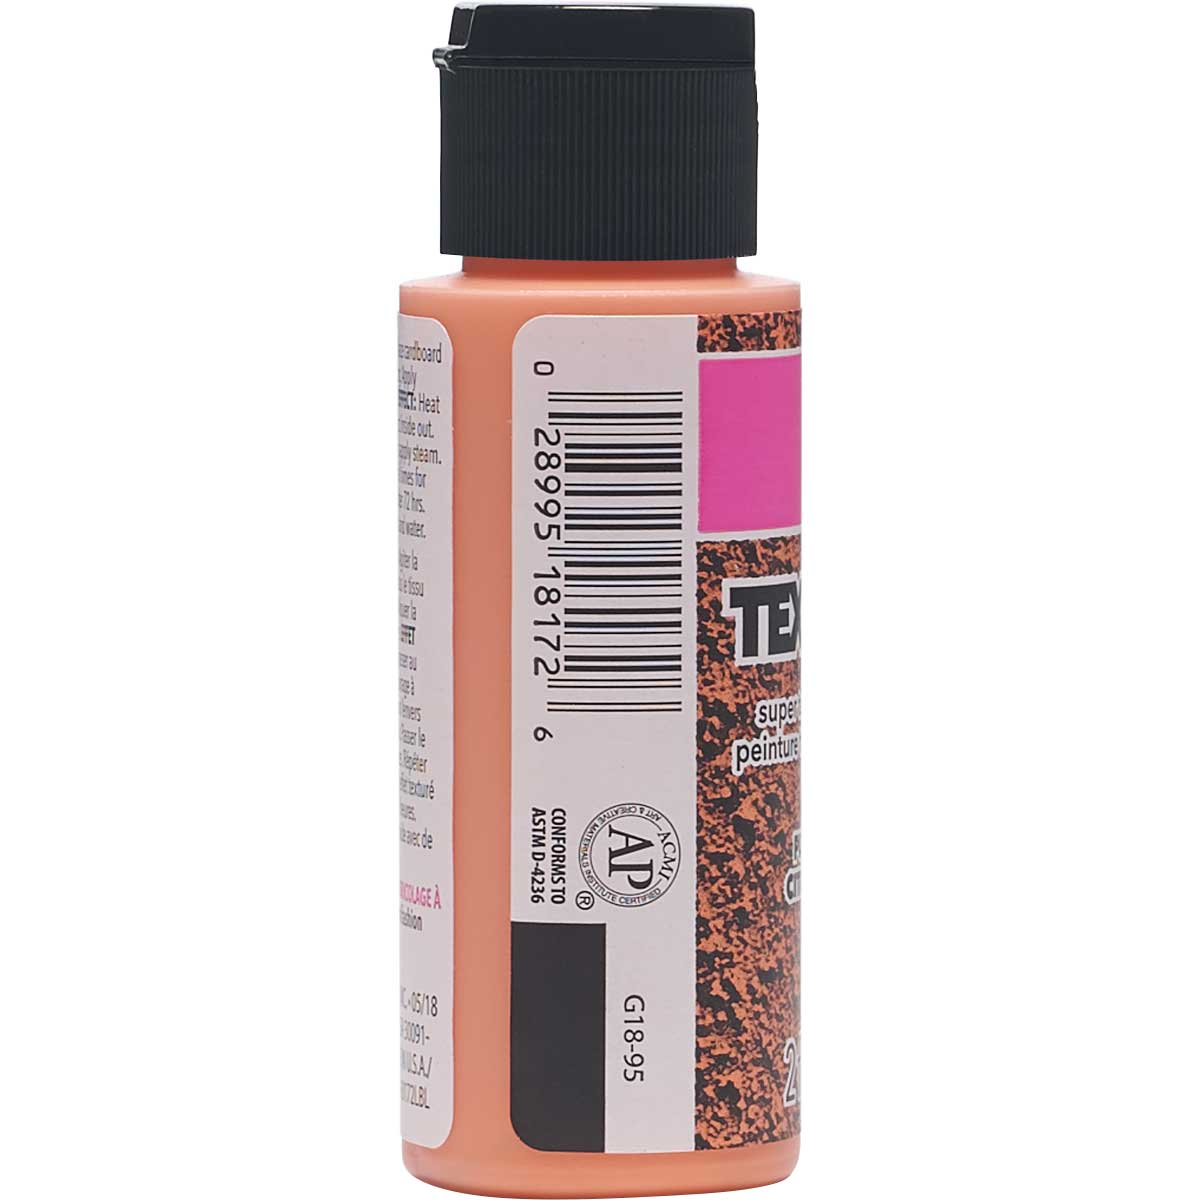 LaurDIY ® Texturific™ Fabric Paint - Pumpkin Spice, 2 oz.